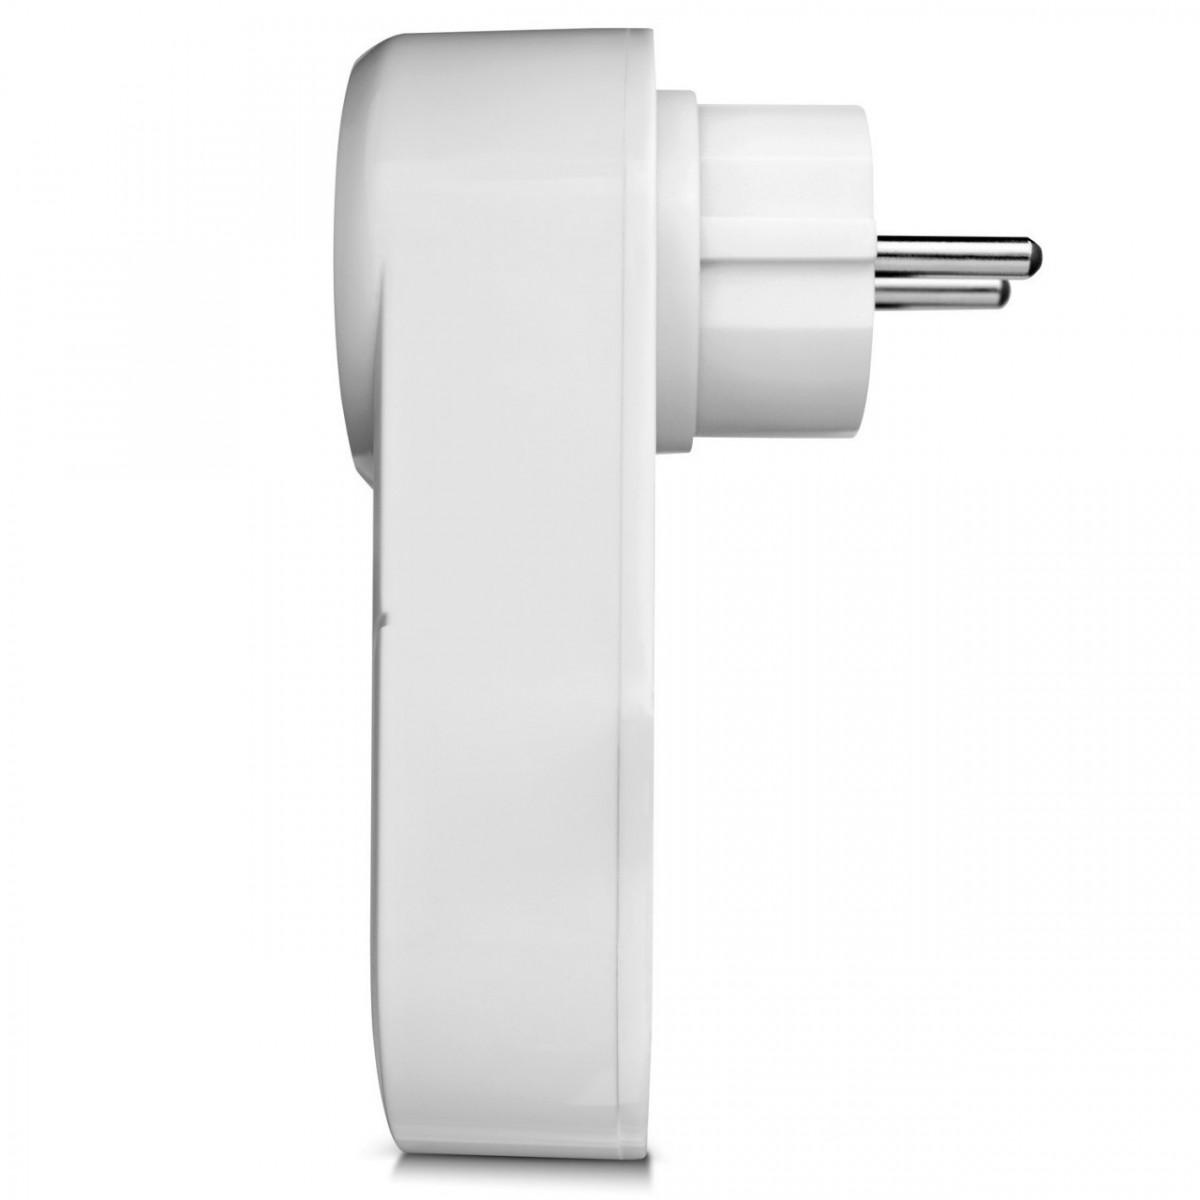 Kitchenaid 5ksm7580xeob Artisan Robot Da Cucina 6 9 L Nero Onice